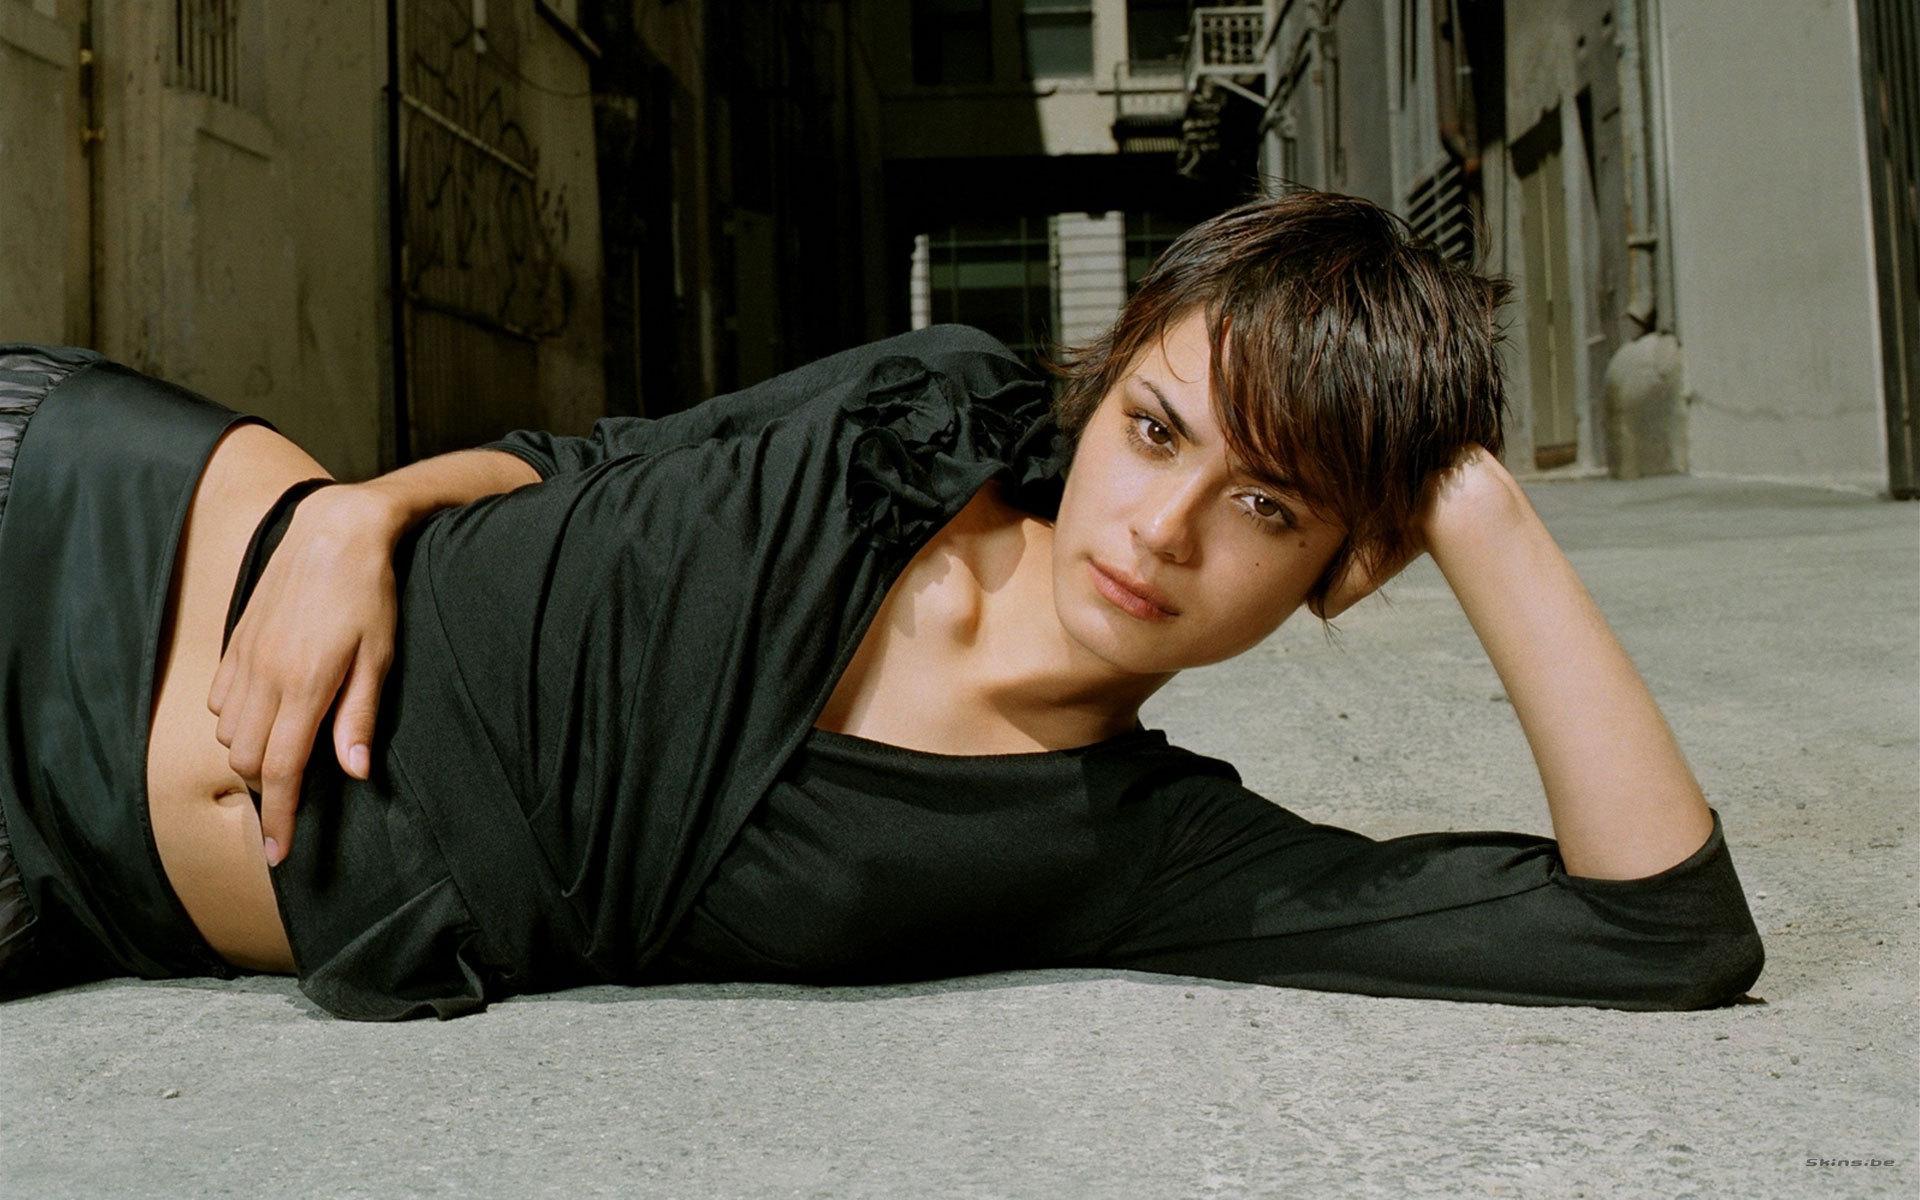 Shannyn Sossamon nude (71 photo) Hot, Instagram, legs